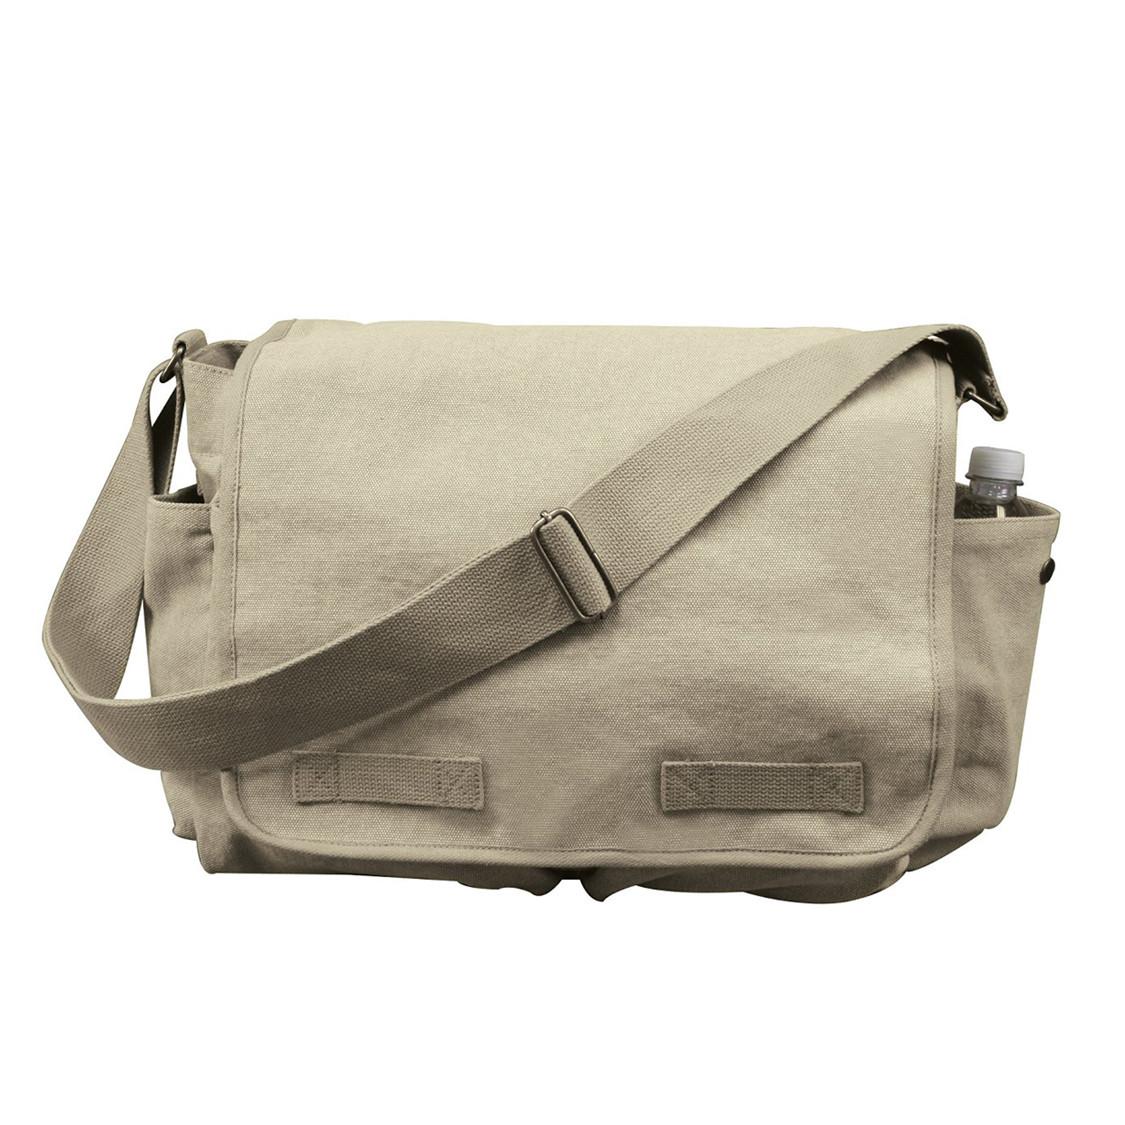 67780eb92 Shop Vintage Khaki Canvas Messenger Bags - Fatigues Army Navy Gear Bags